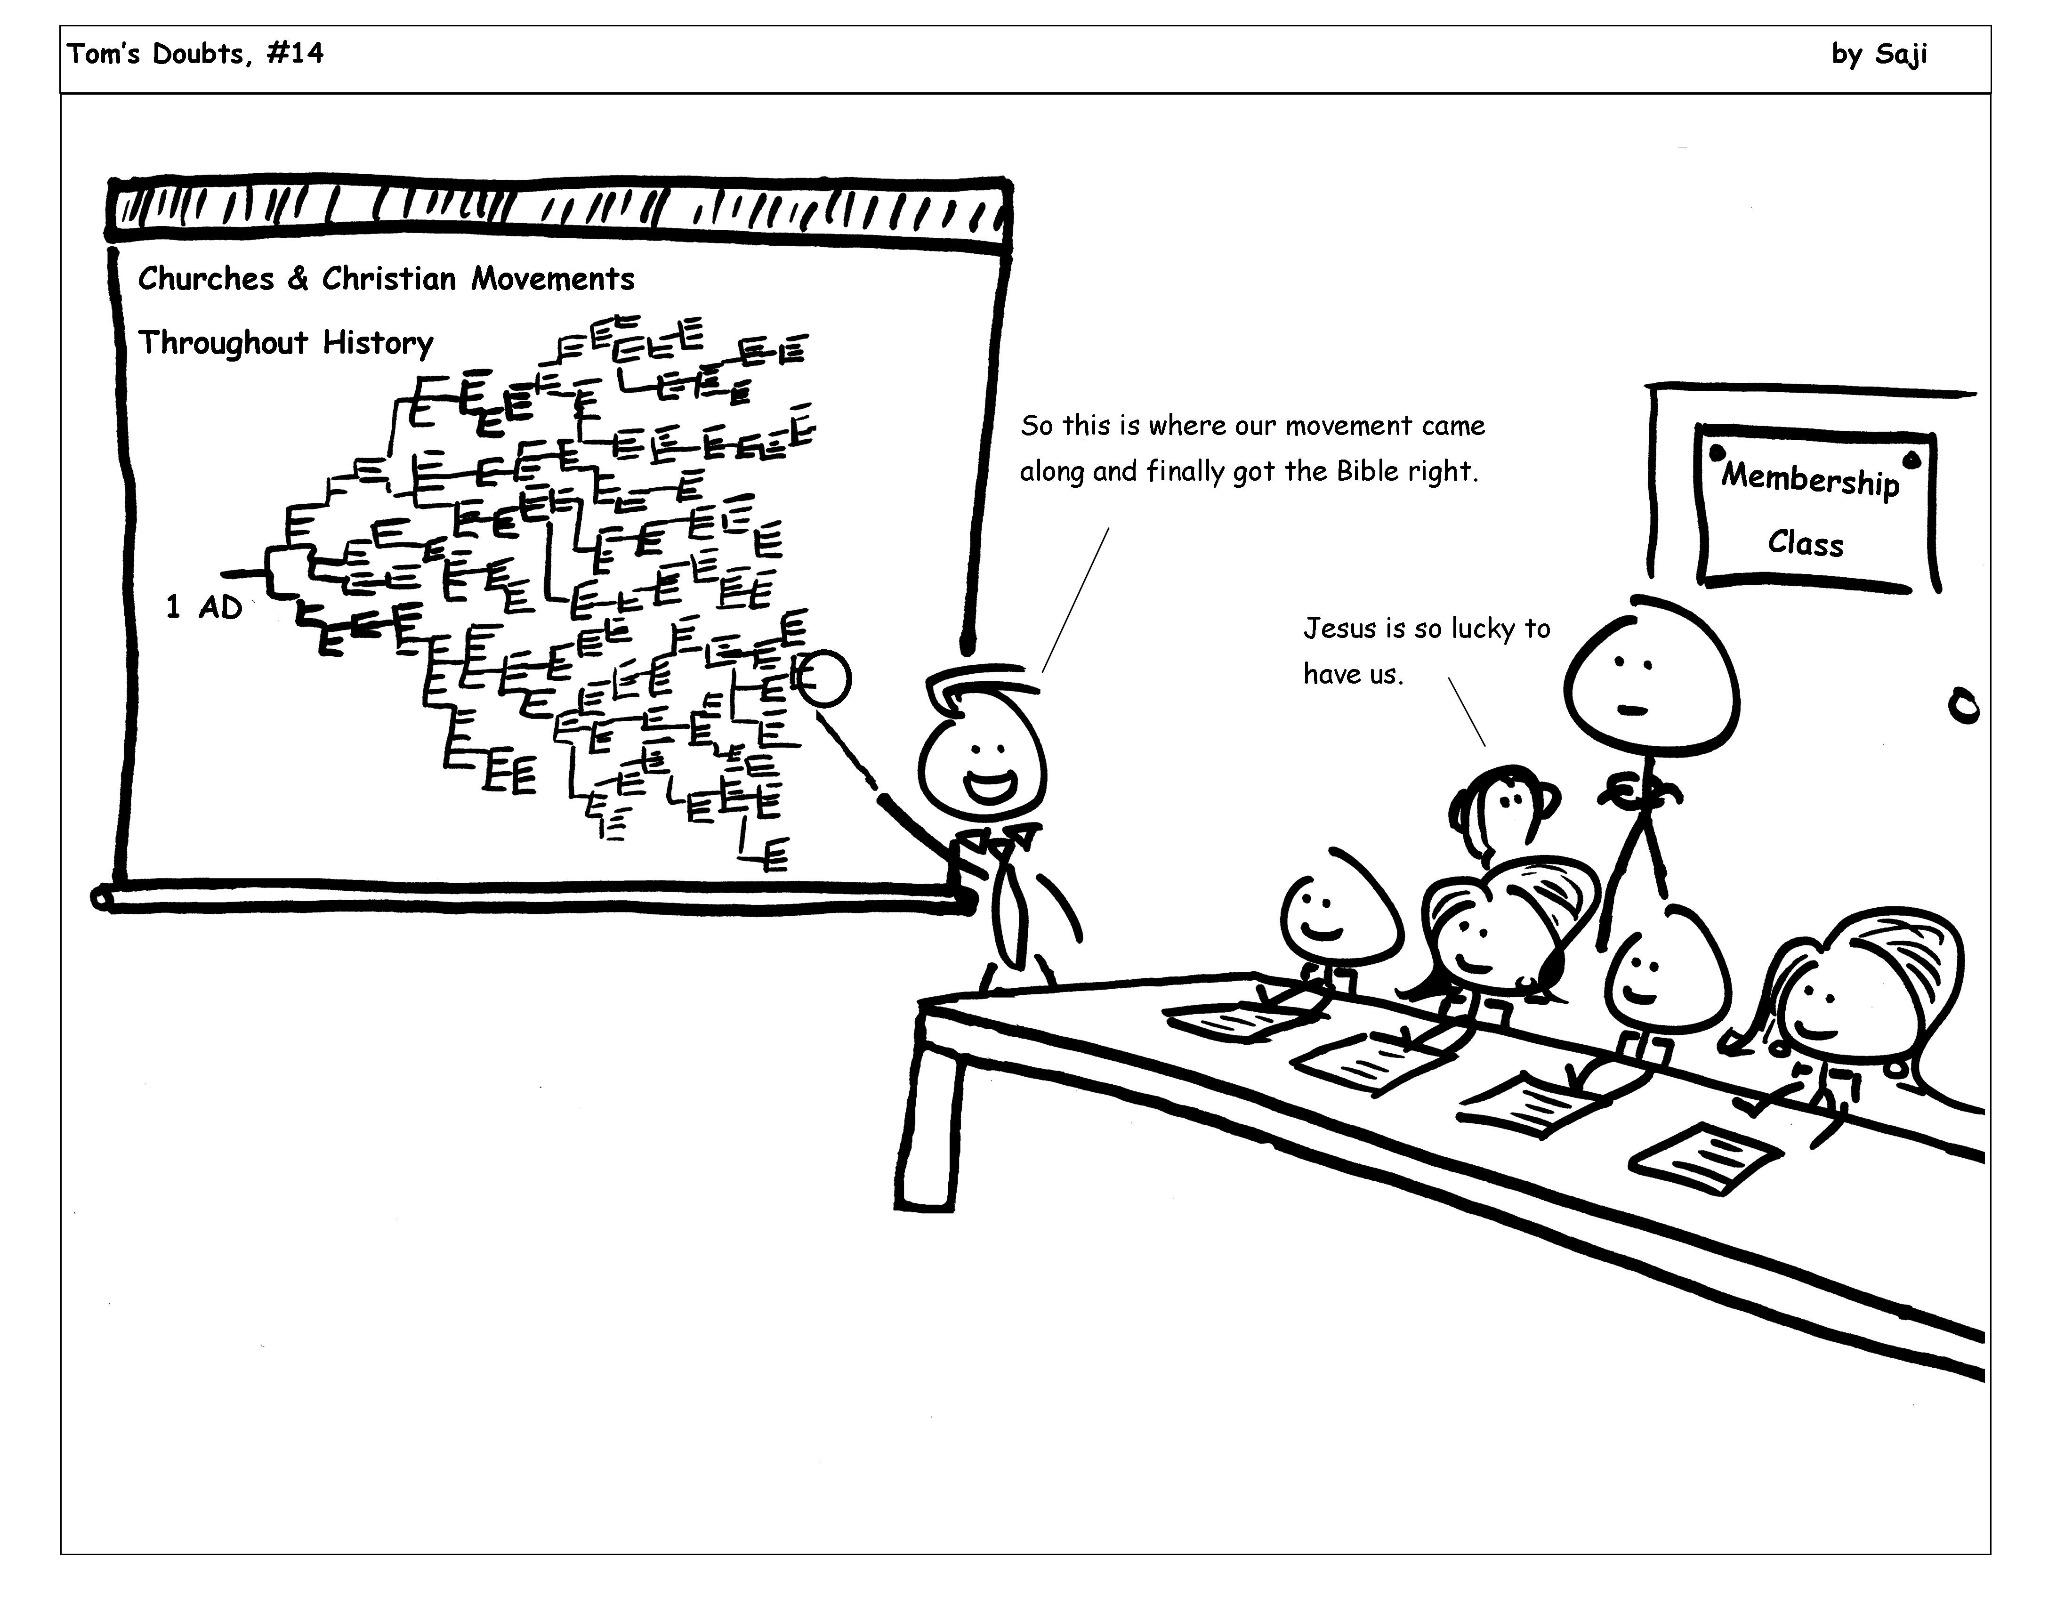 The cartoon Tom's Doubts, #14